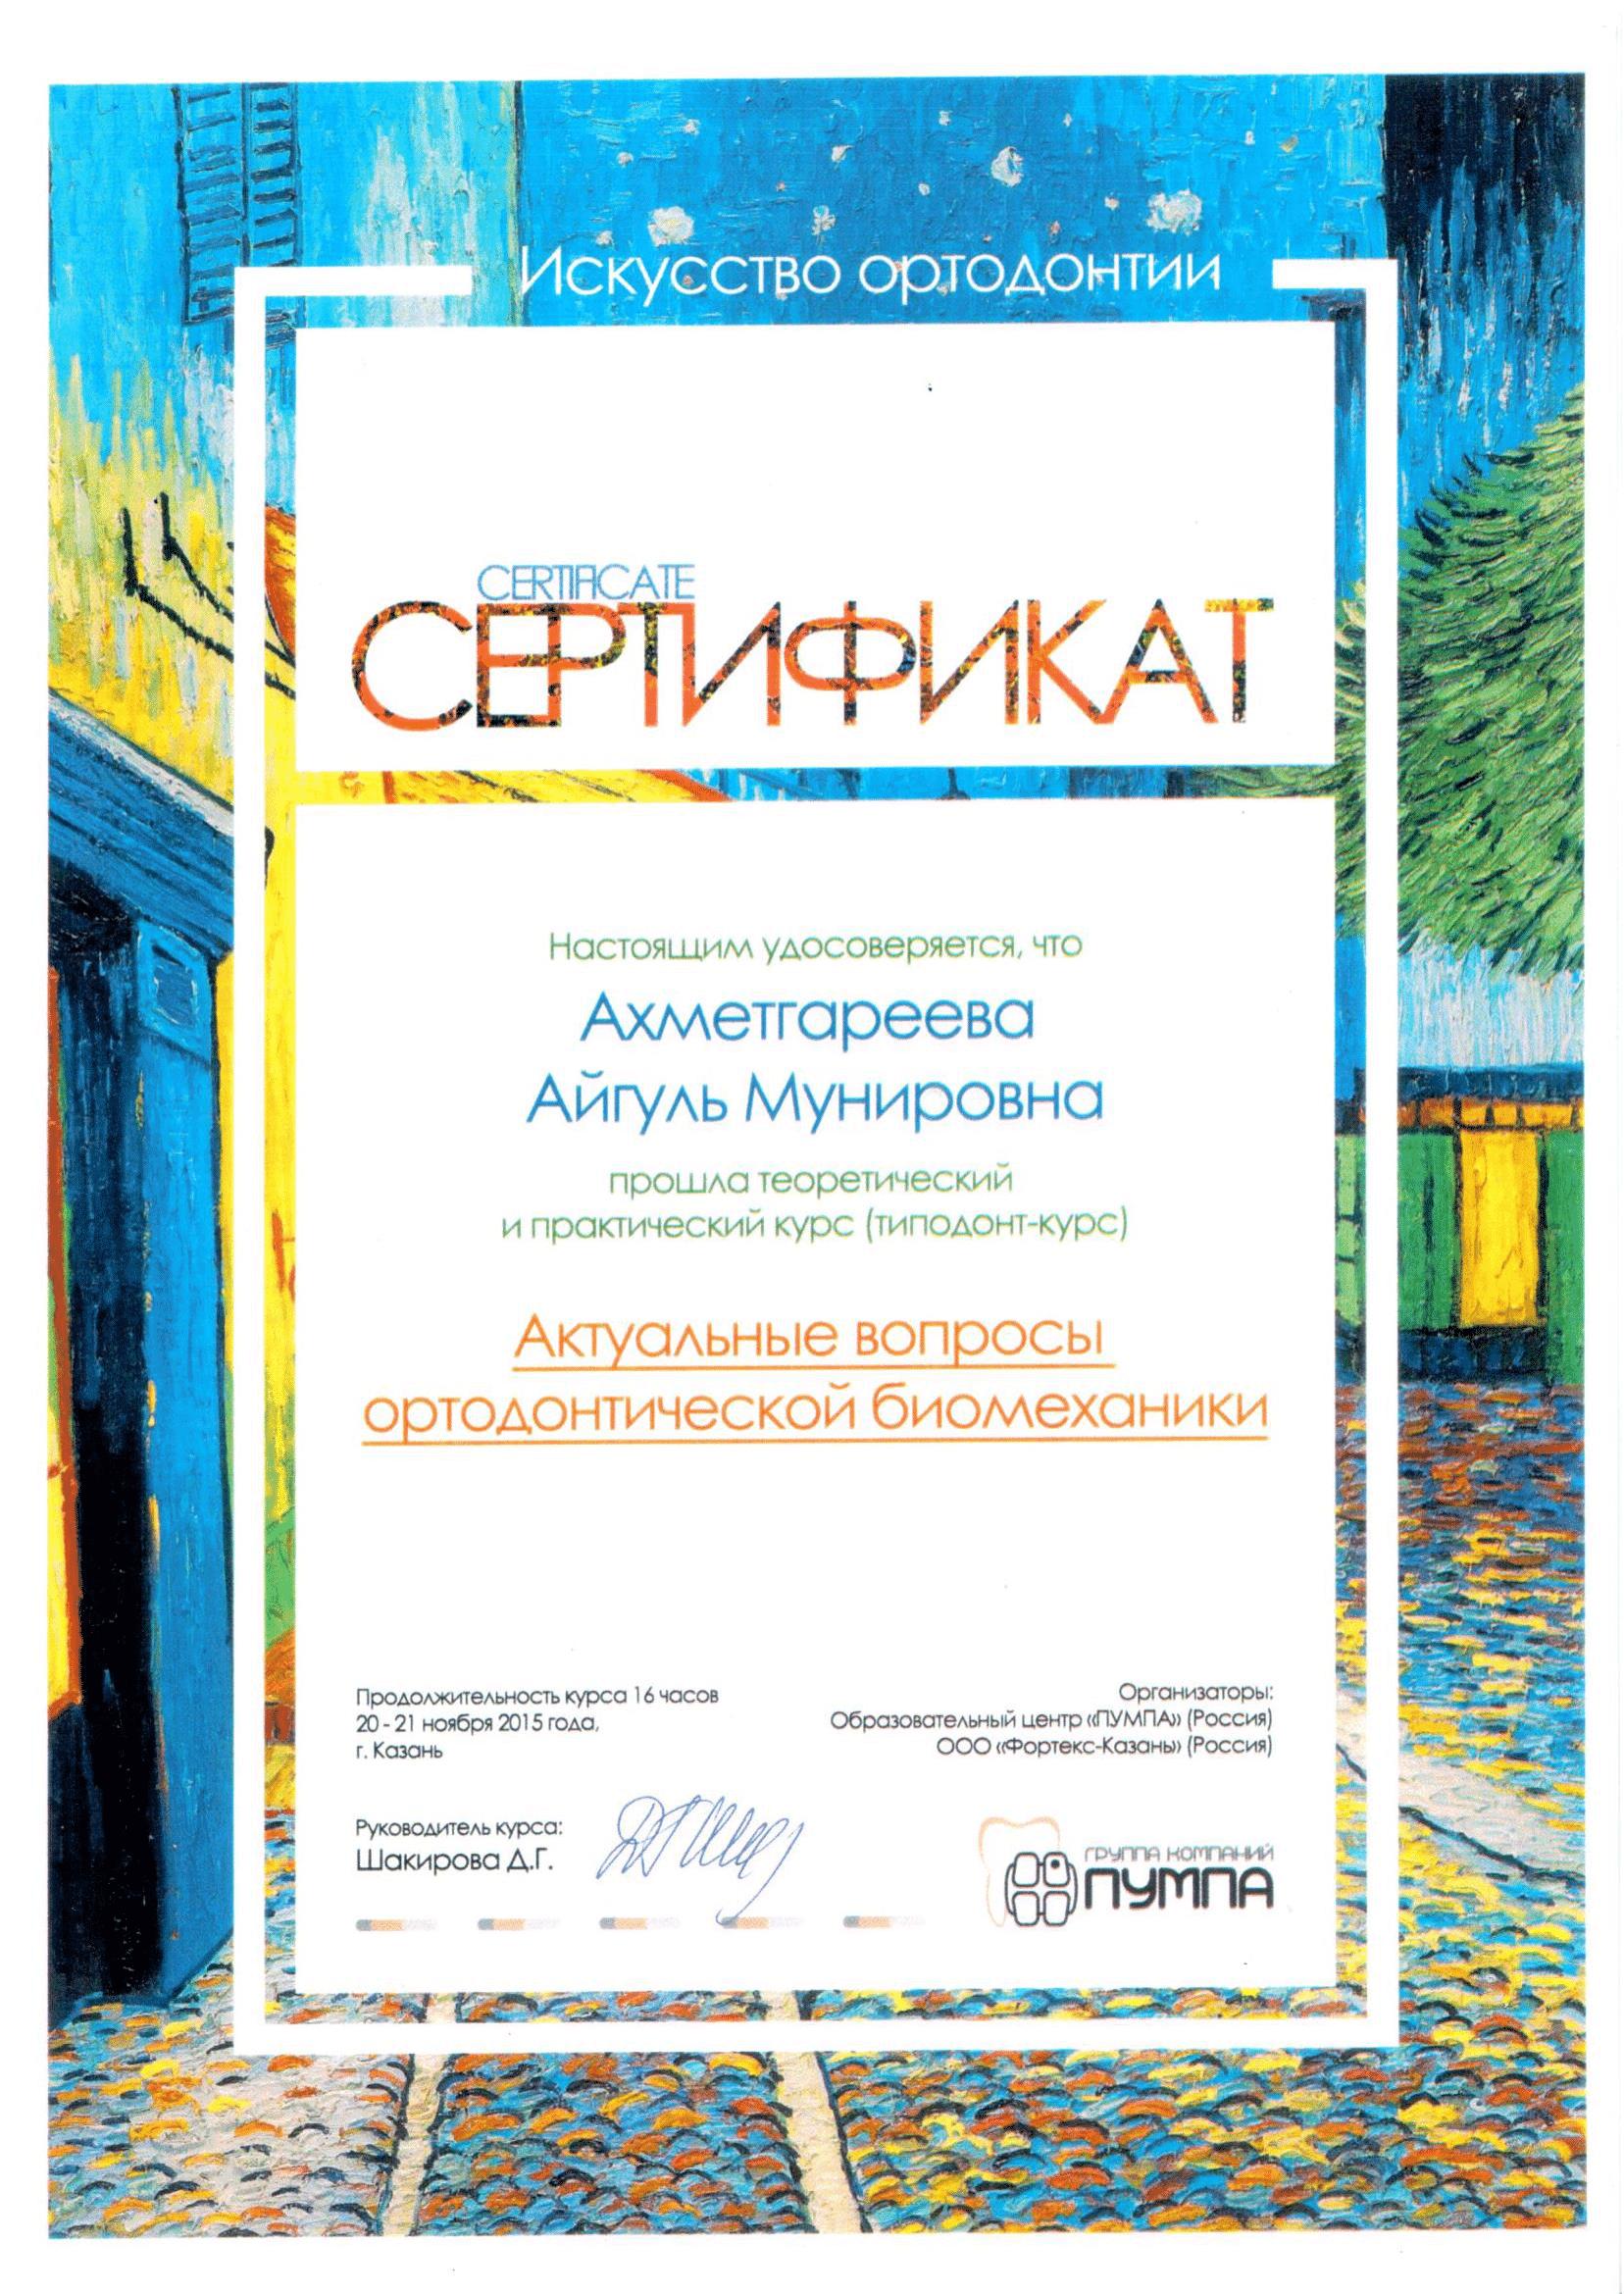 Документы на имя Ахметгареева Айгуль Мунировна